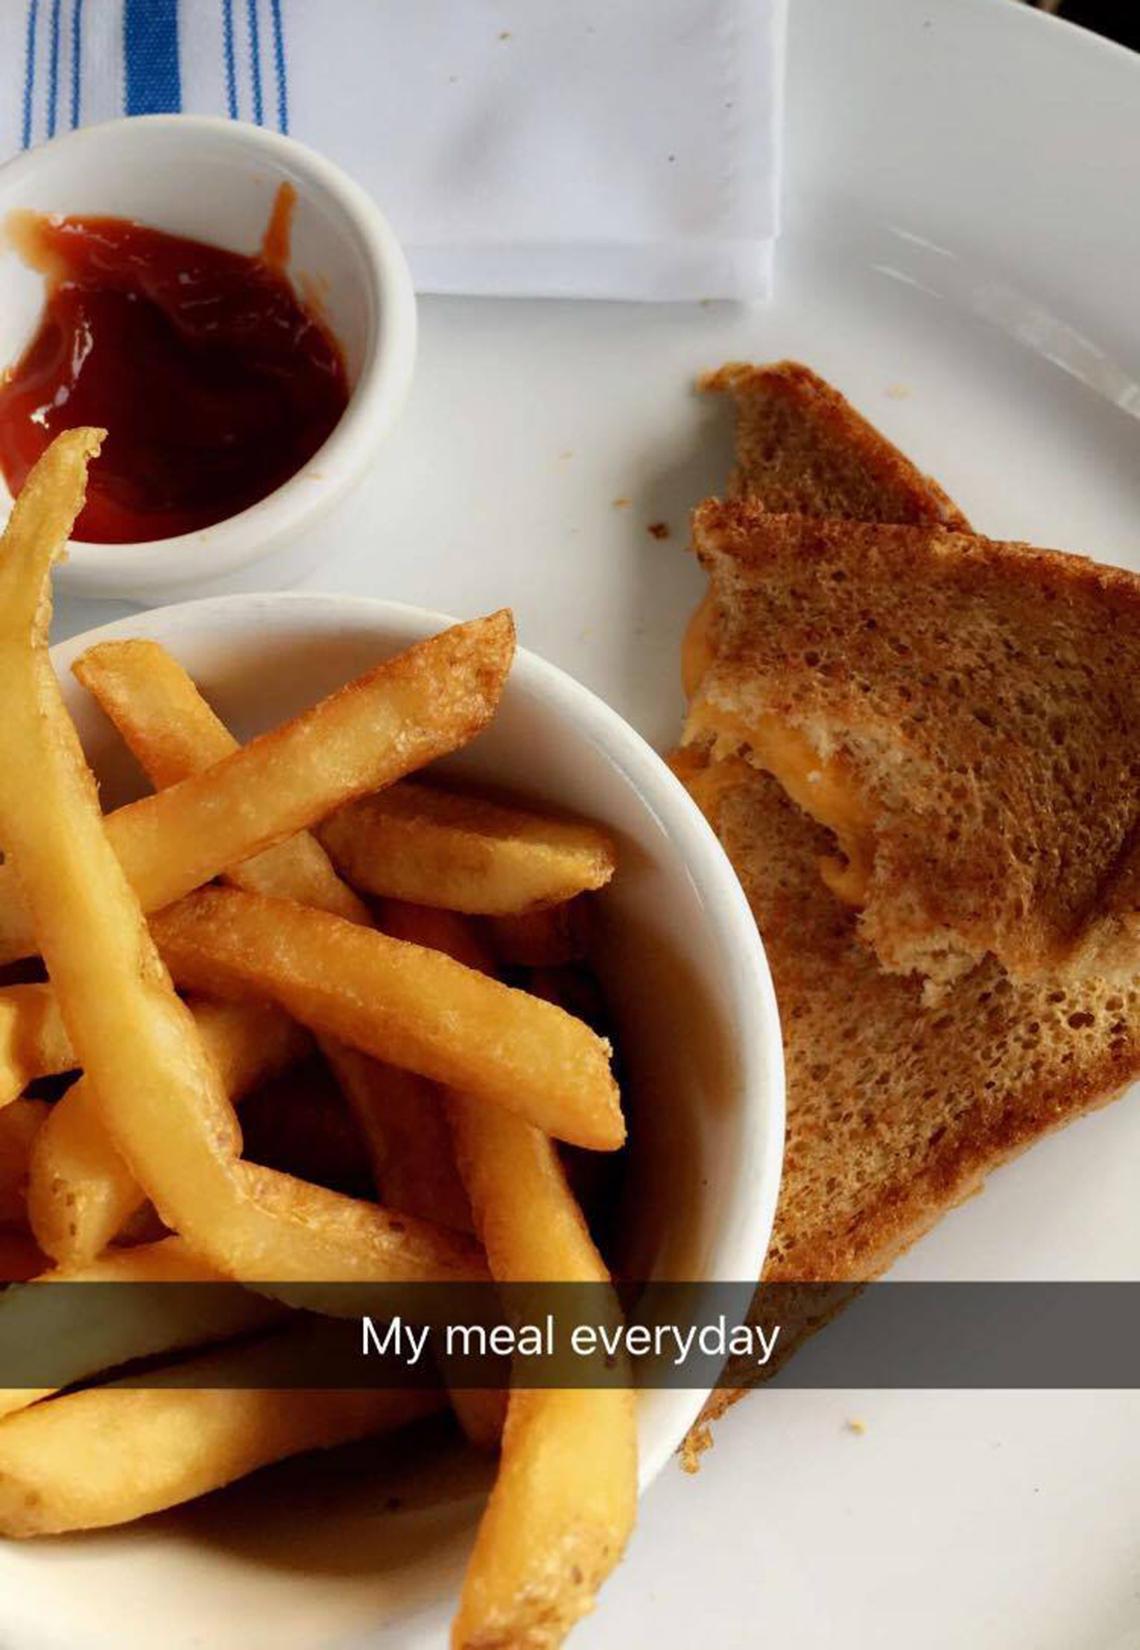 bella hadid lunch